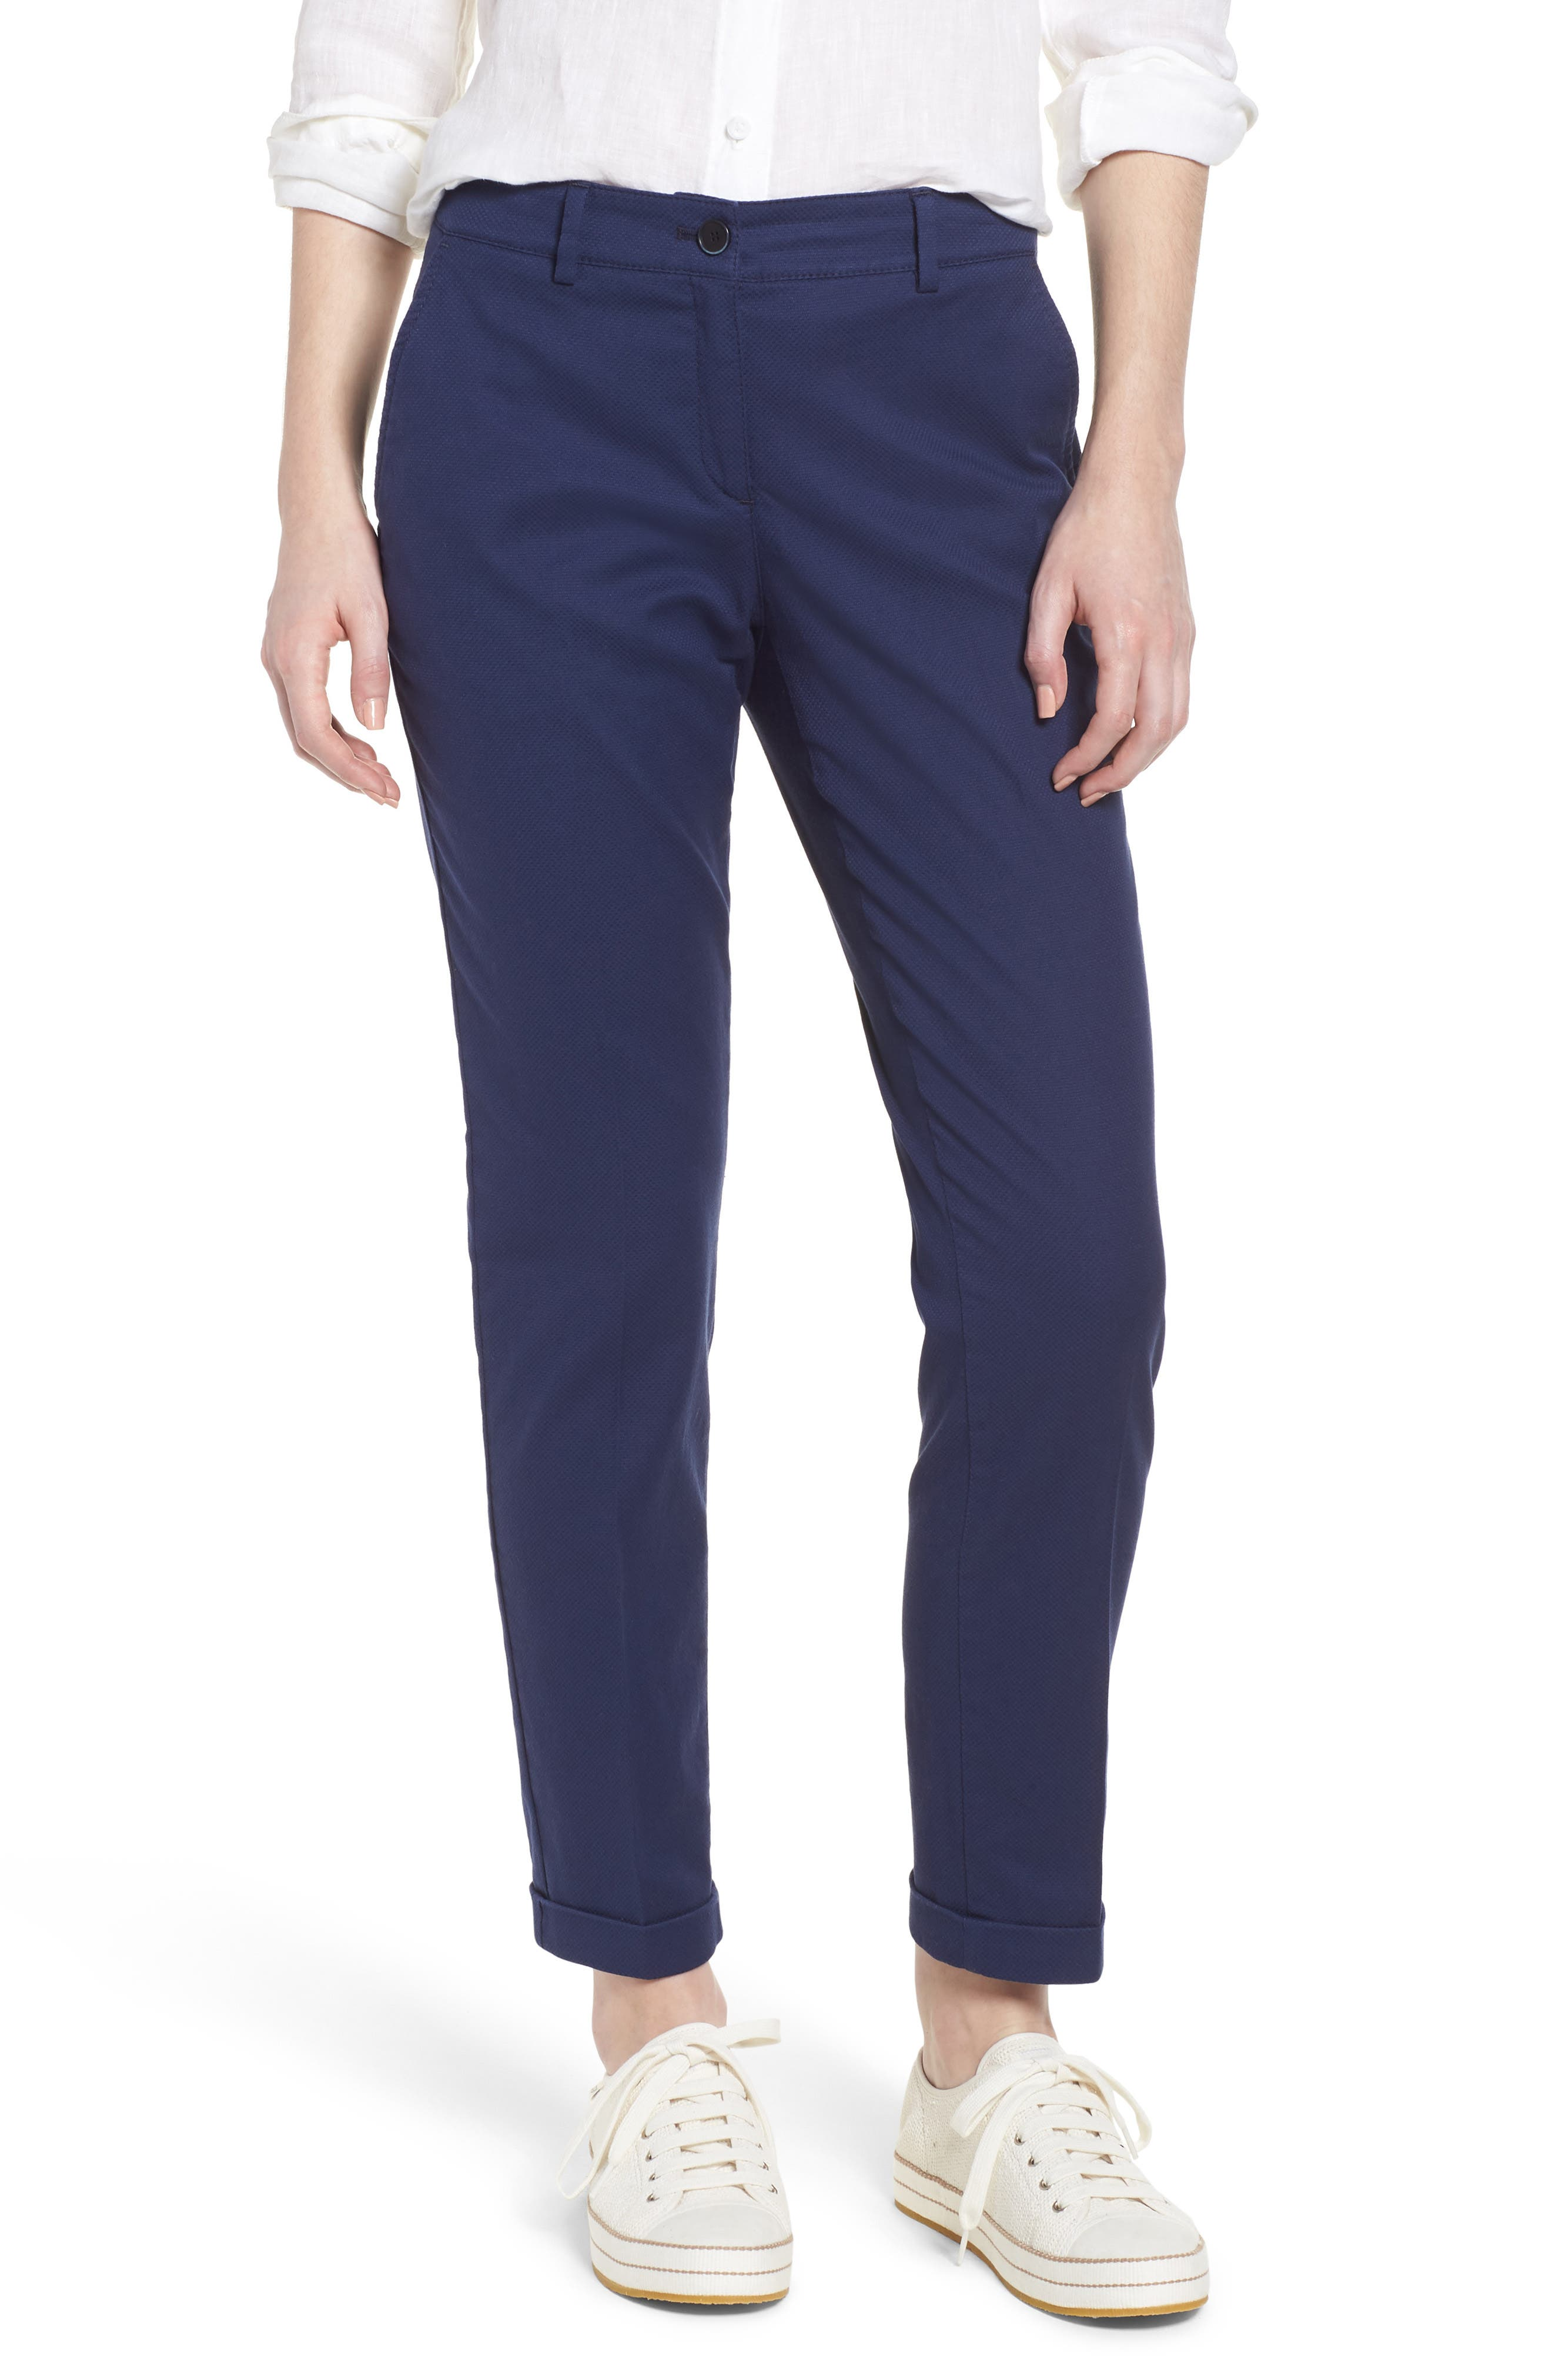 Maron Cuffed Straight Leg Pants,                             Main thumbnail 1, color,                             Navy